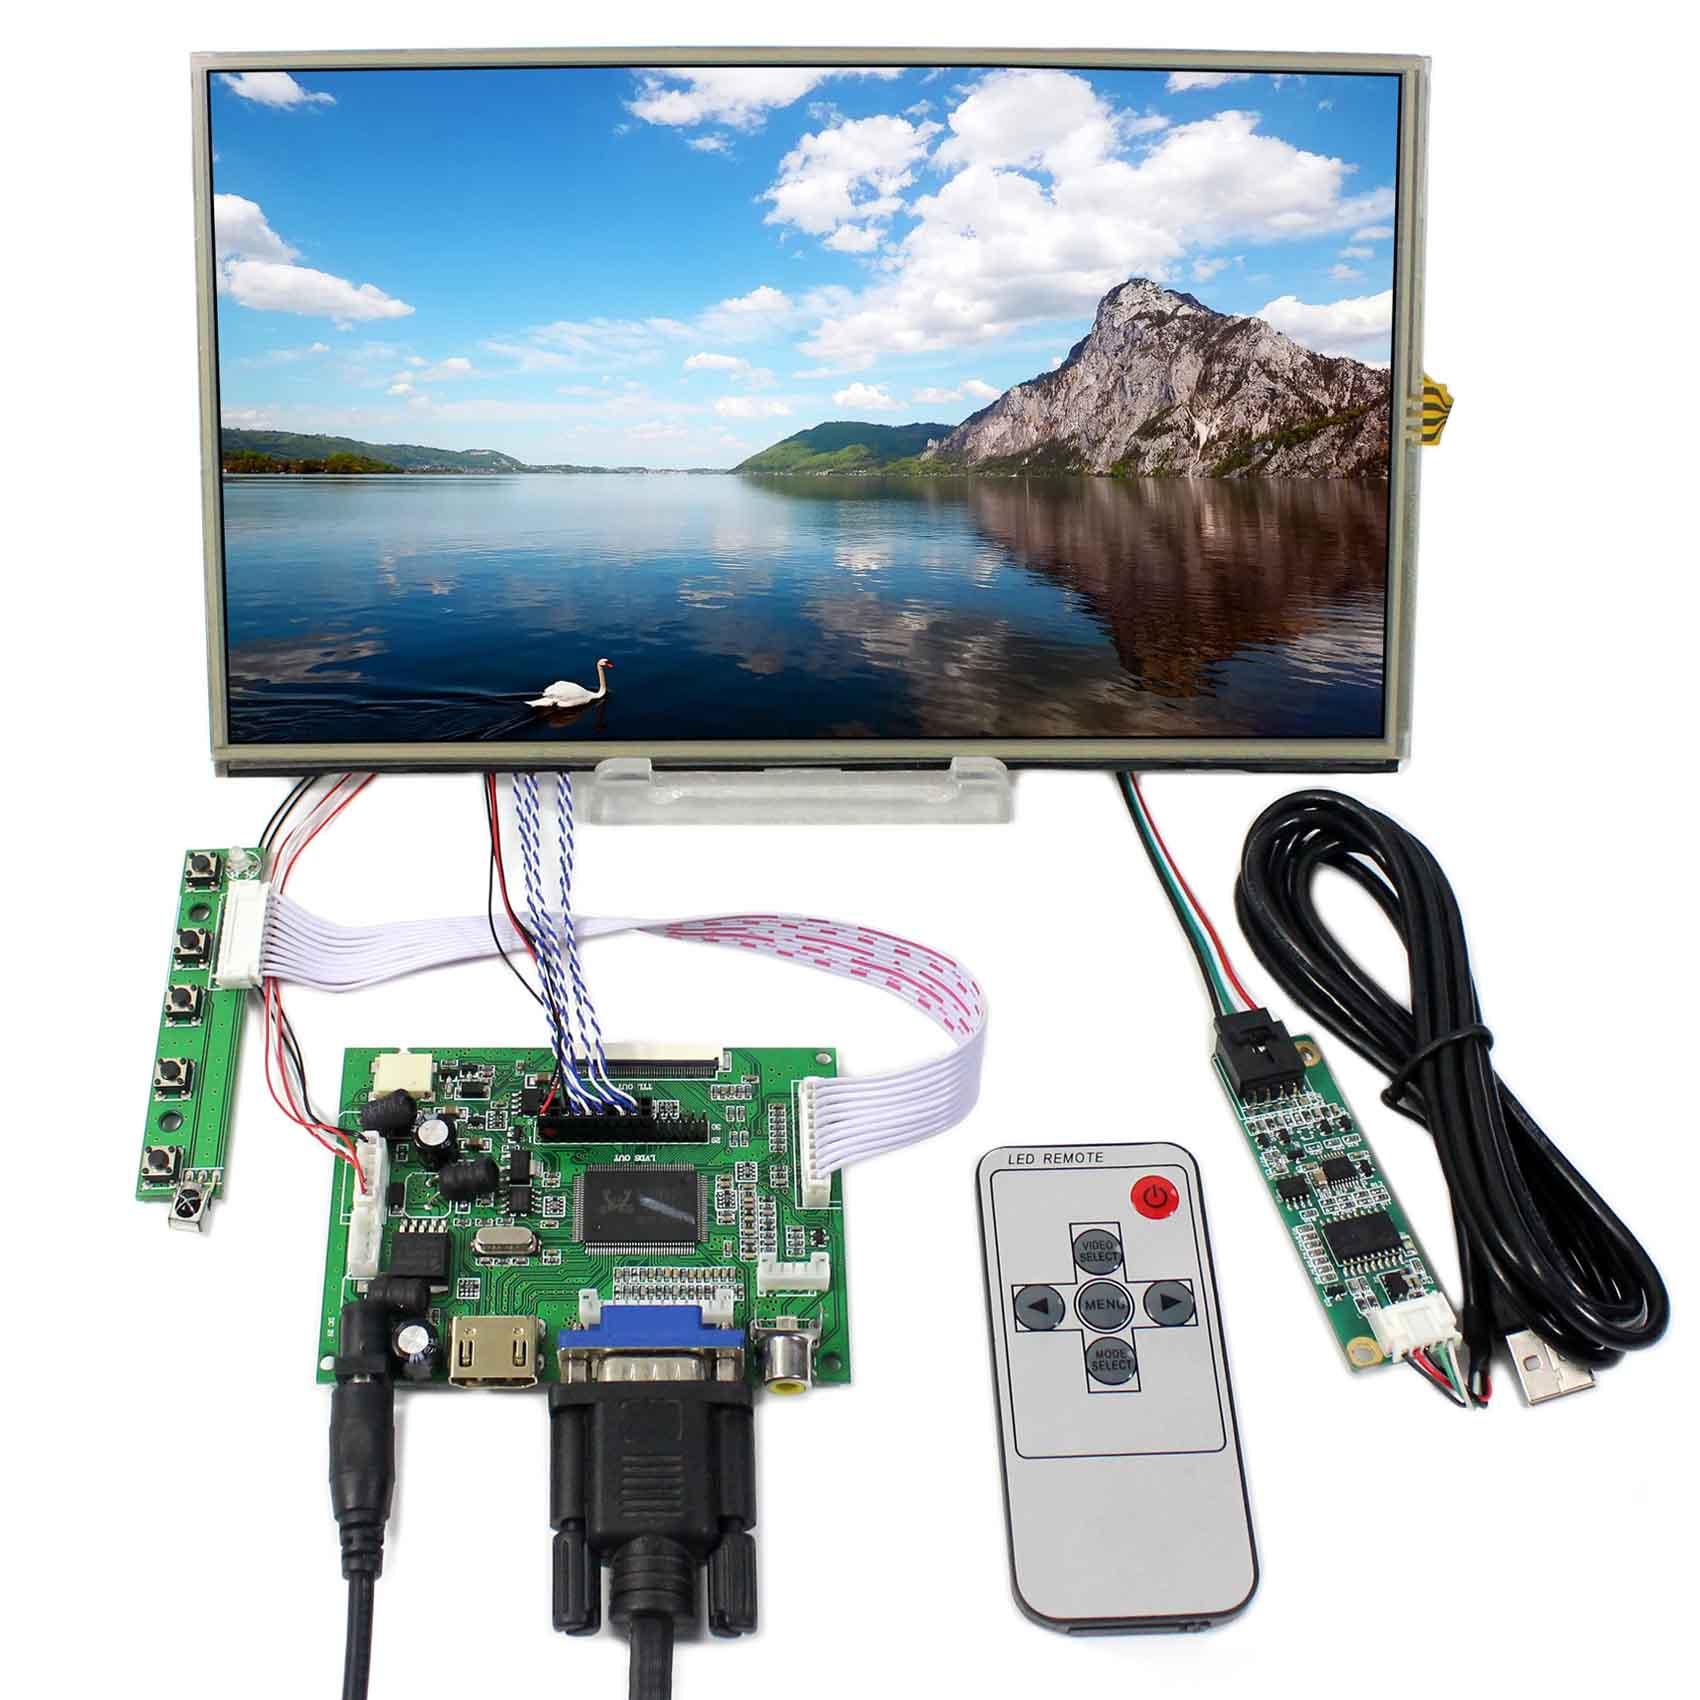 HDMI VGA 2AV LCD Controller Board 10.1inch B101XAN01 1366x768 Touch LCD Screen vga hdmi lcd controller board for lp156whu tpb1 lp156whu tpa1 lp156whu tpbh lp156whu tpd1 15 6 inch edp 30 pins 1 lane 1366x768